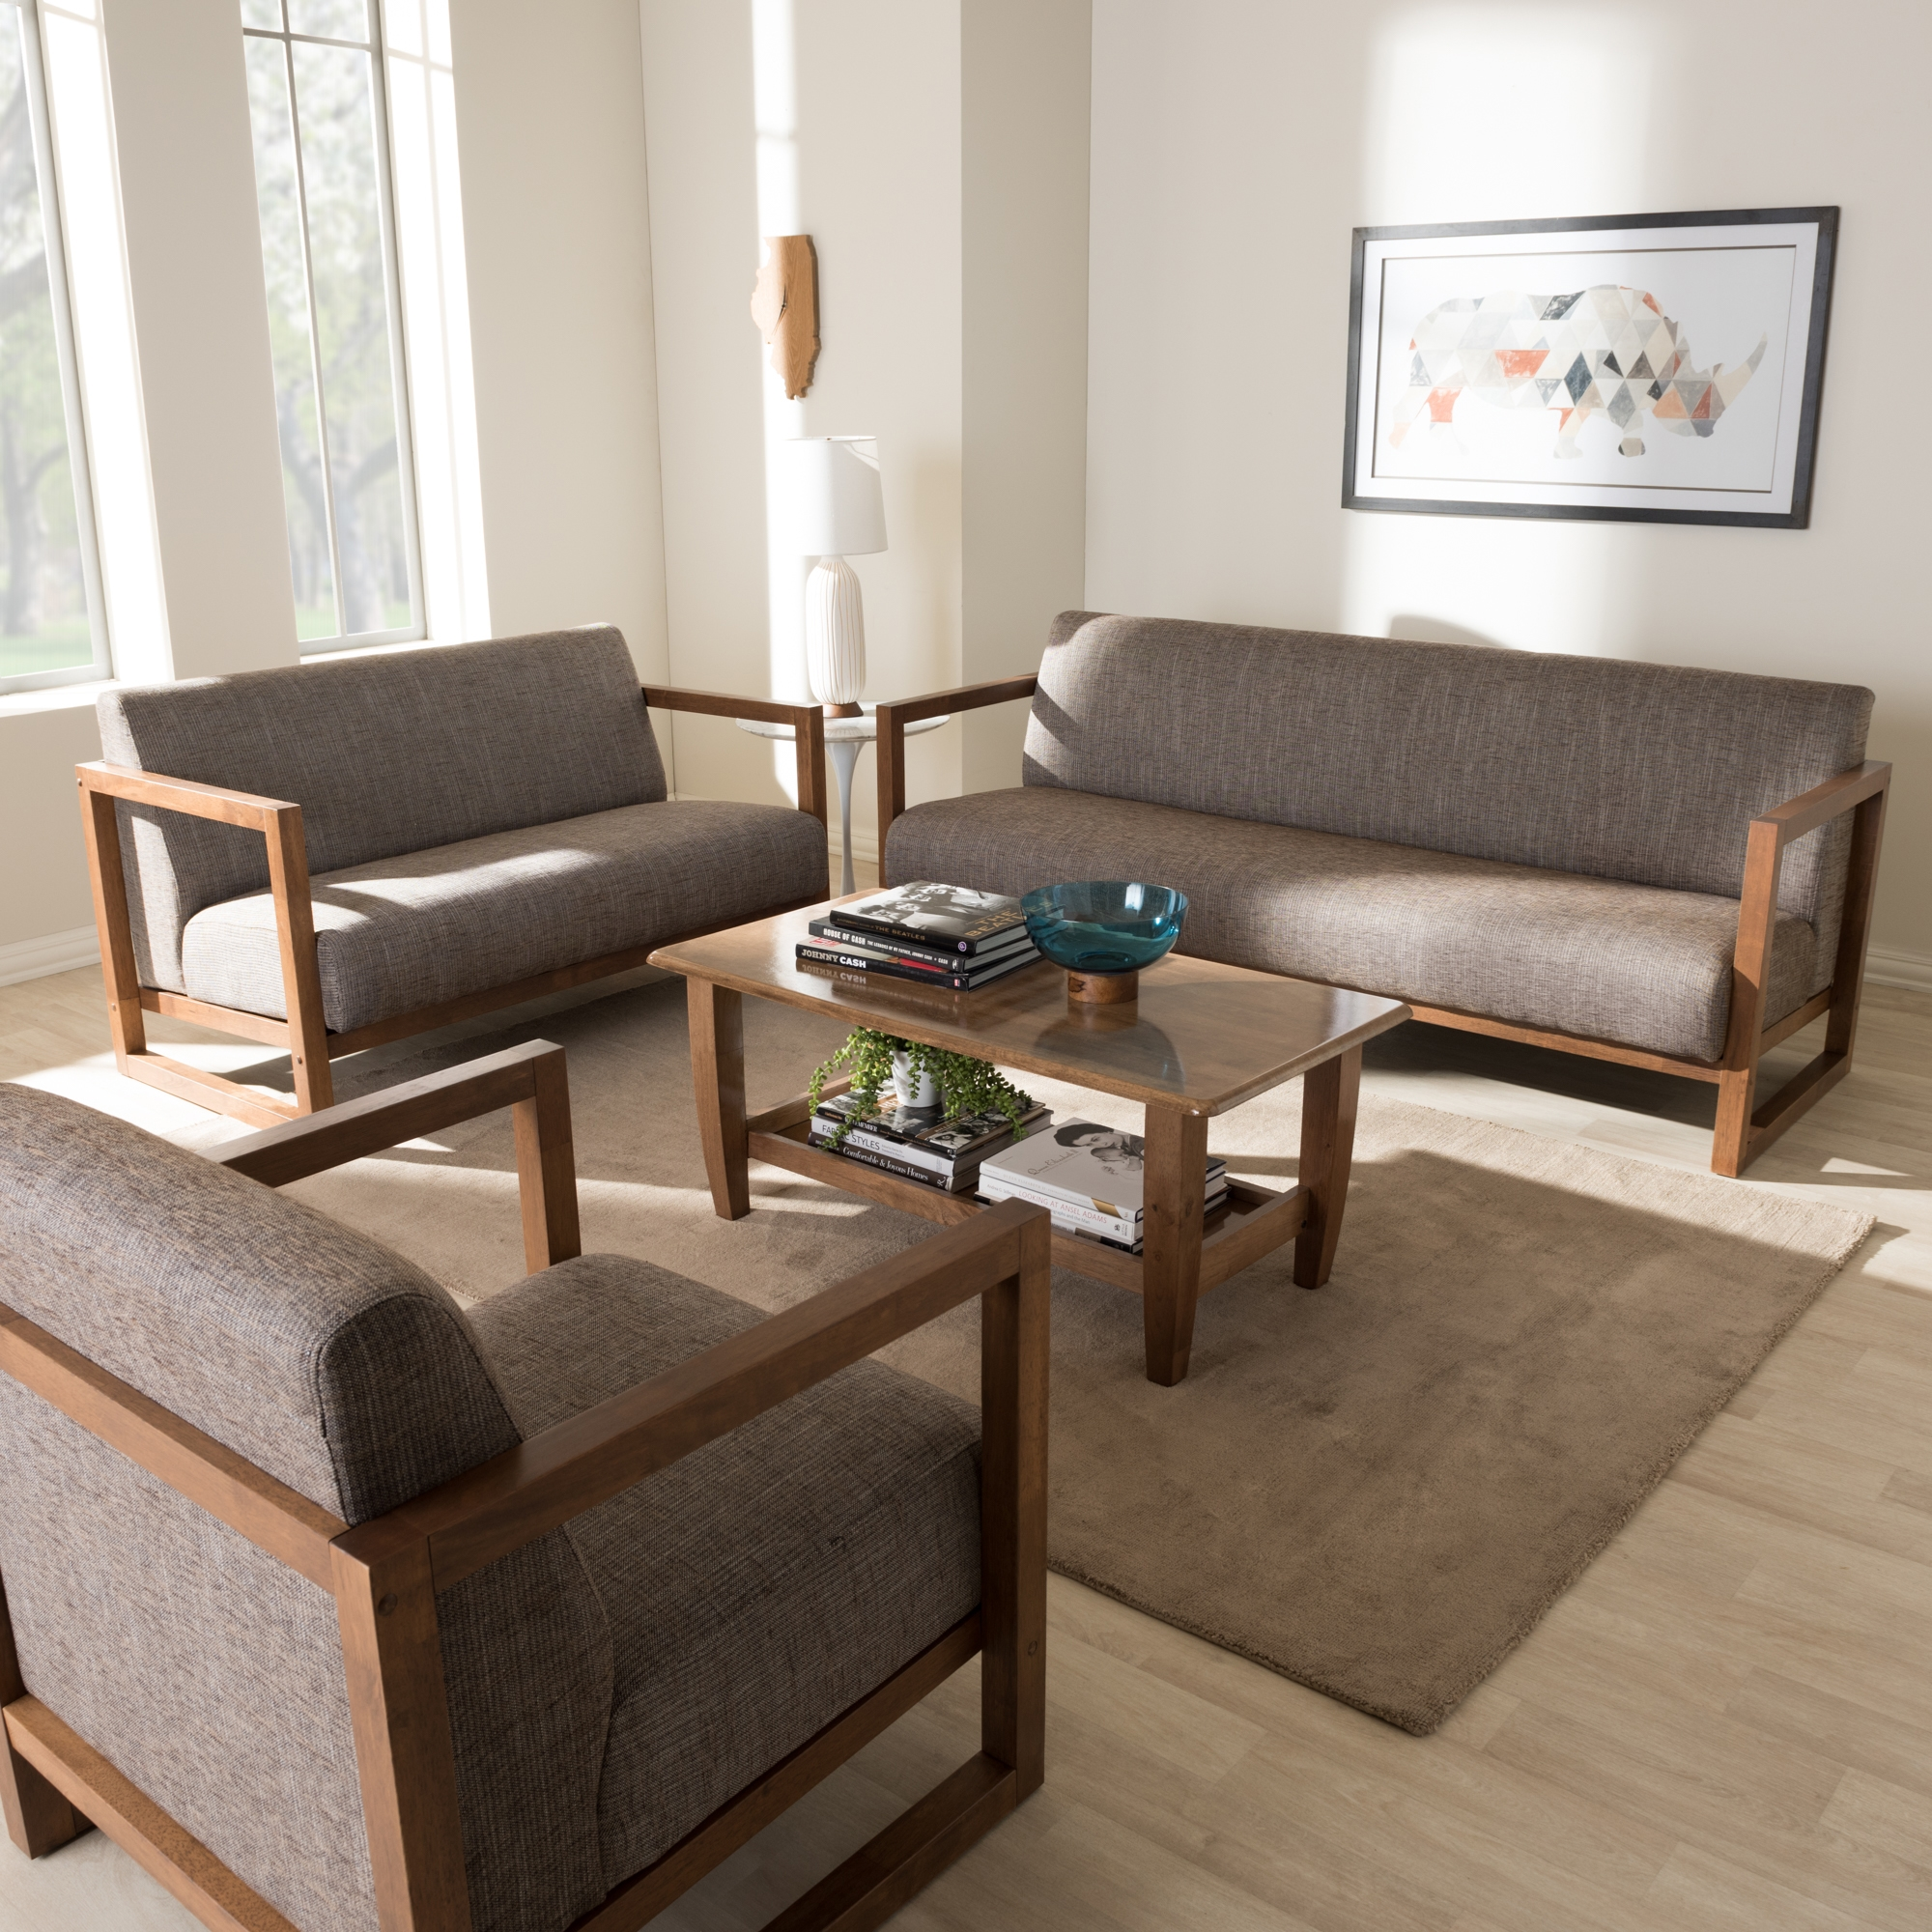 ... Baxton Studio Valencia Mid Century Modern Walnut Wood Finished Gravel  Fabric Upholstered 3 Piece ...